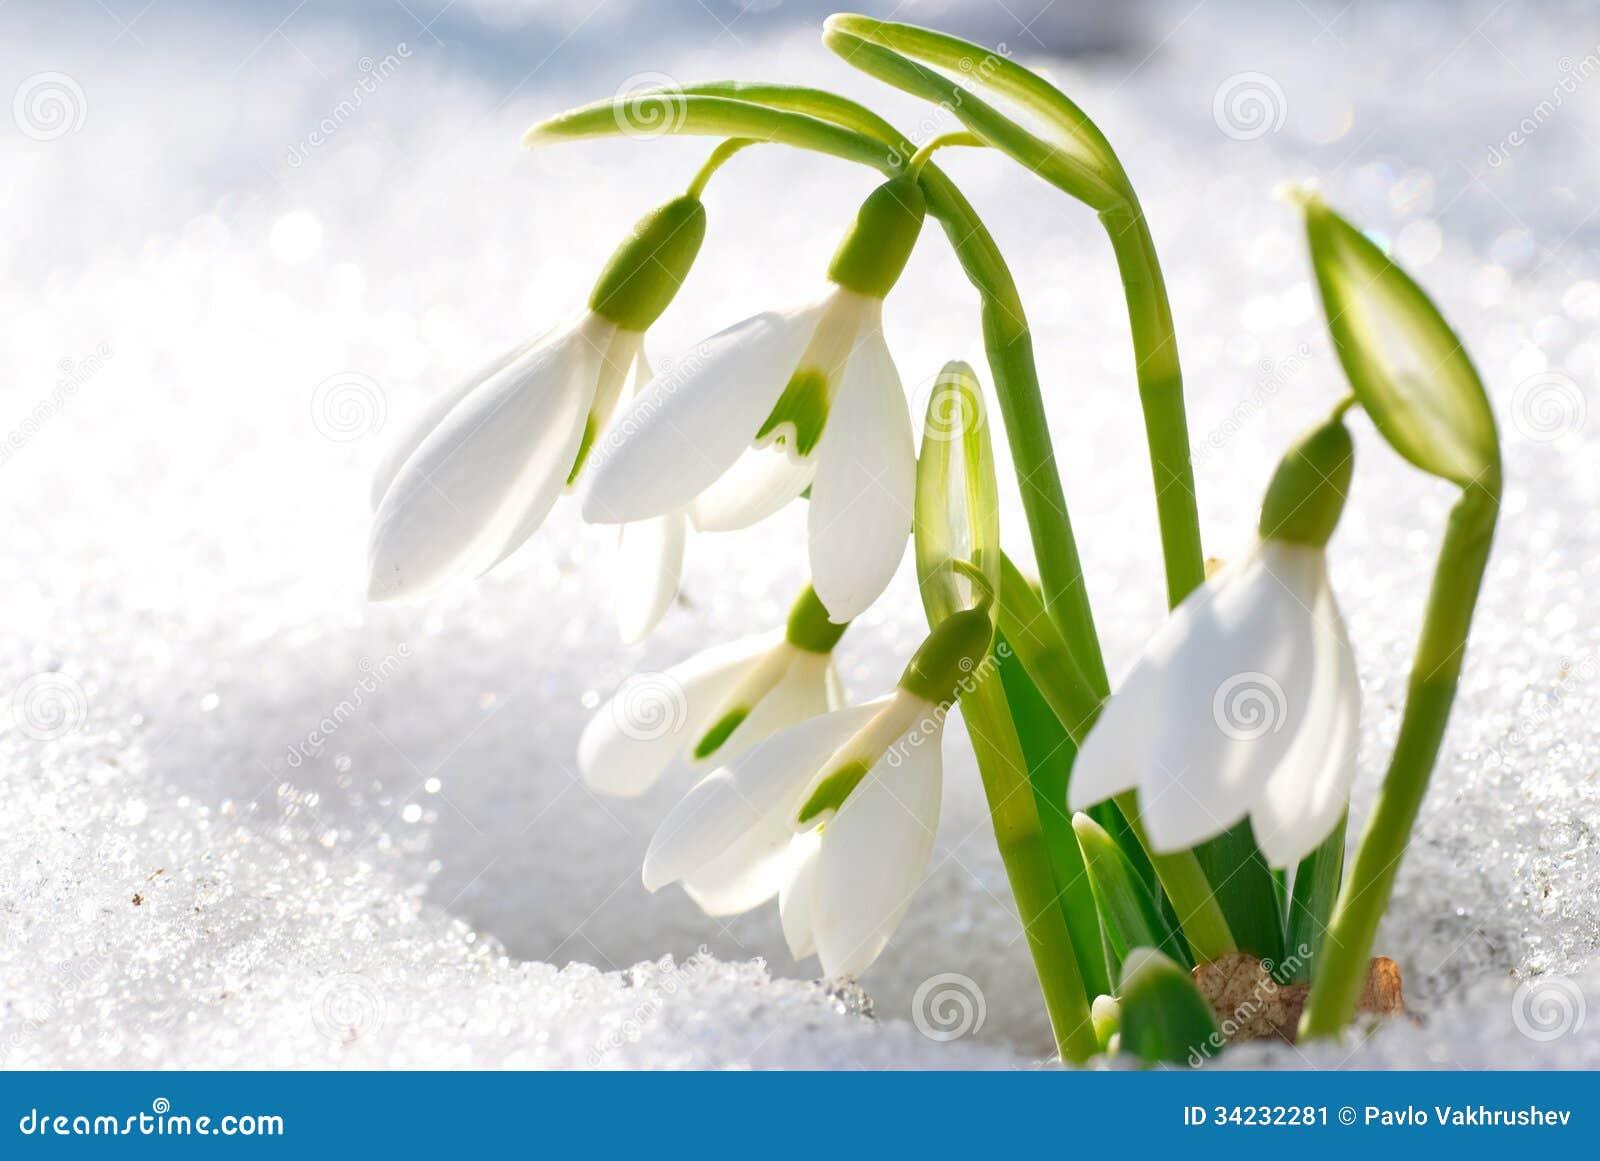 spring snowdrop flowers stock image image of closeup 34232281